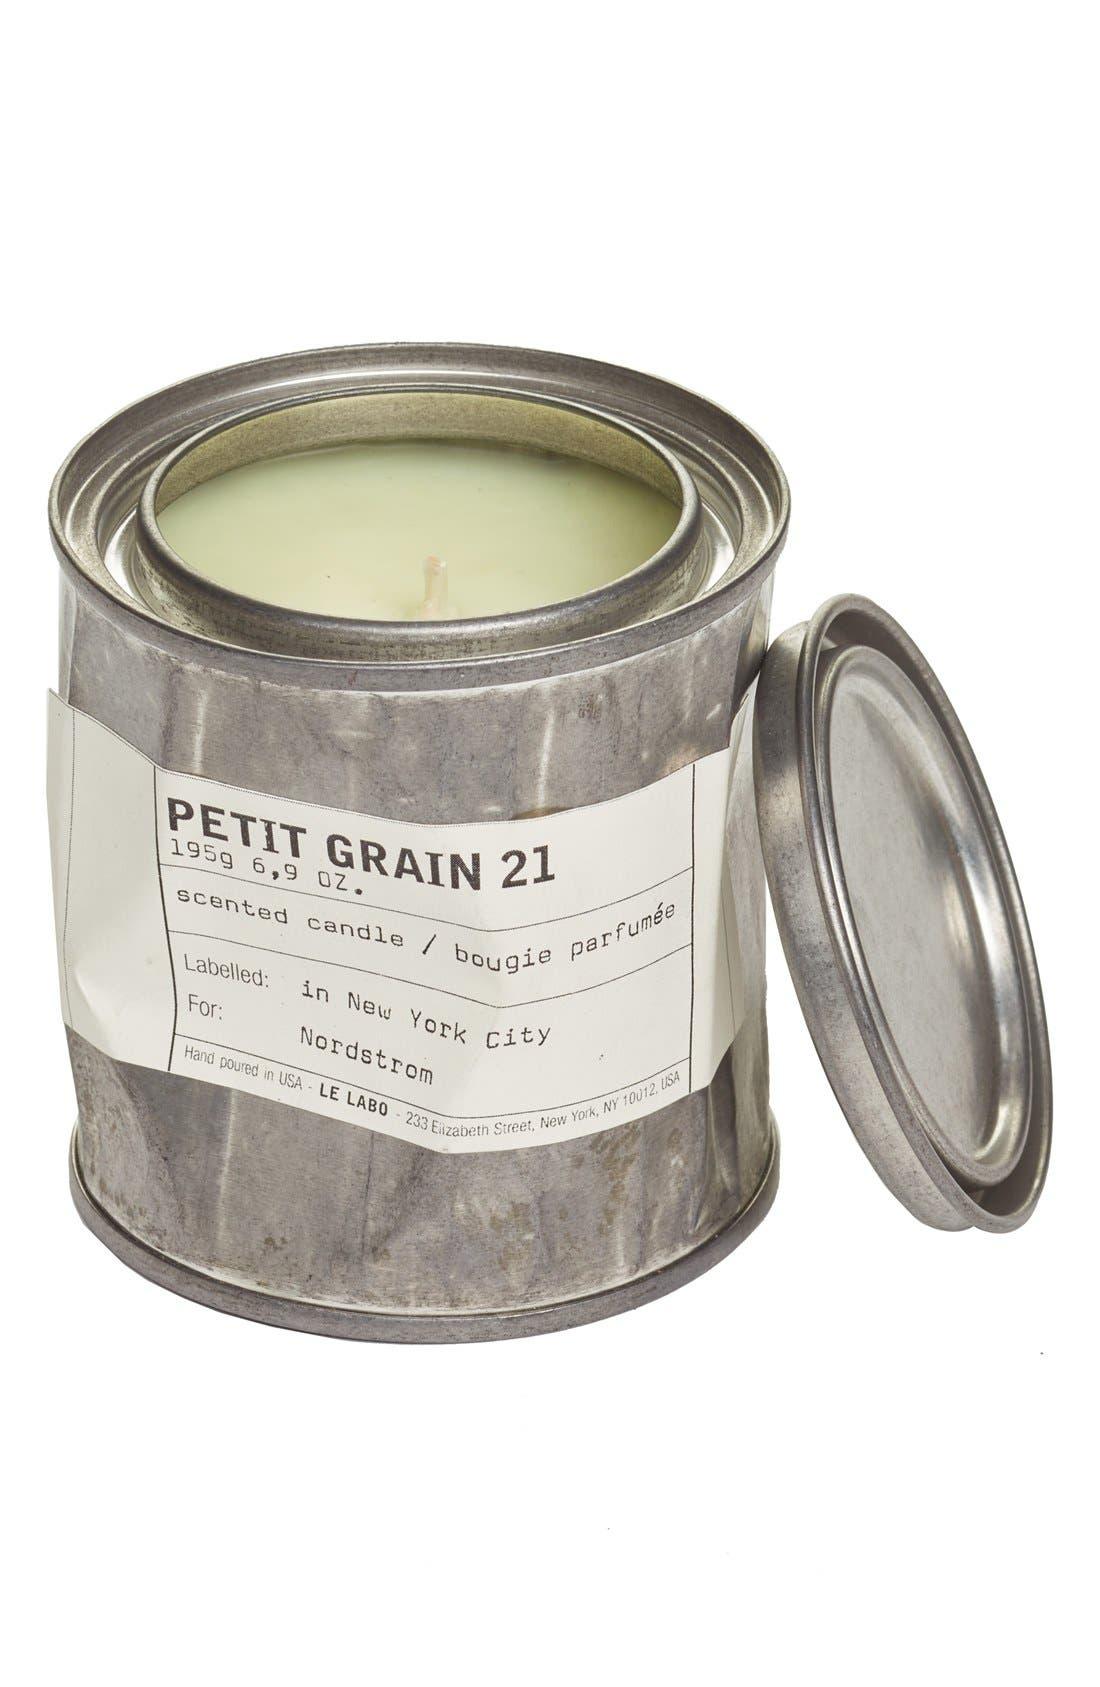 Alternate Image 1 Selected - Le Labo 'Petit Grain 21' Vintage Tin Candle